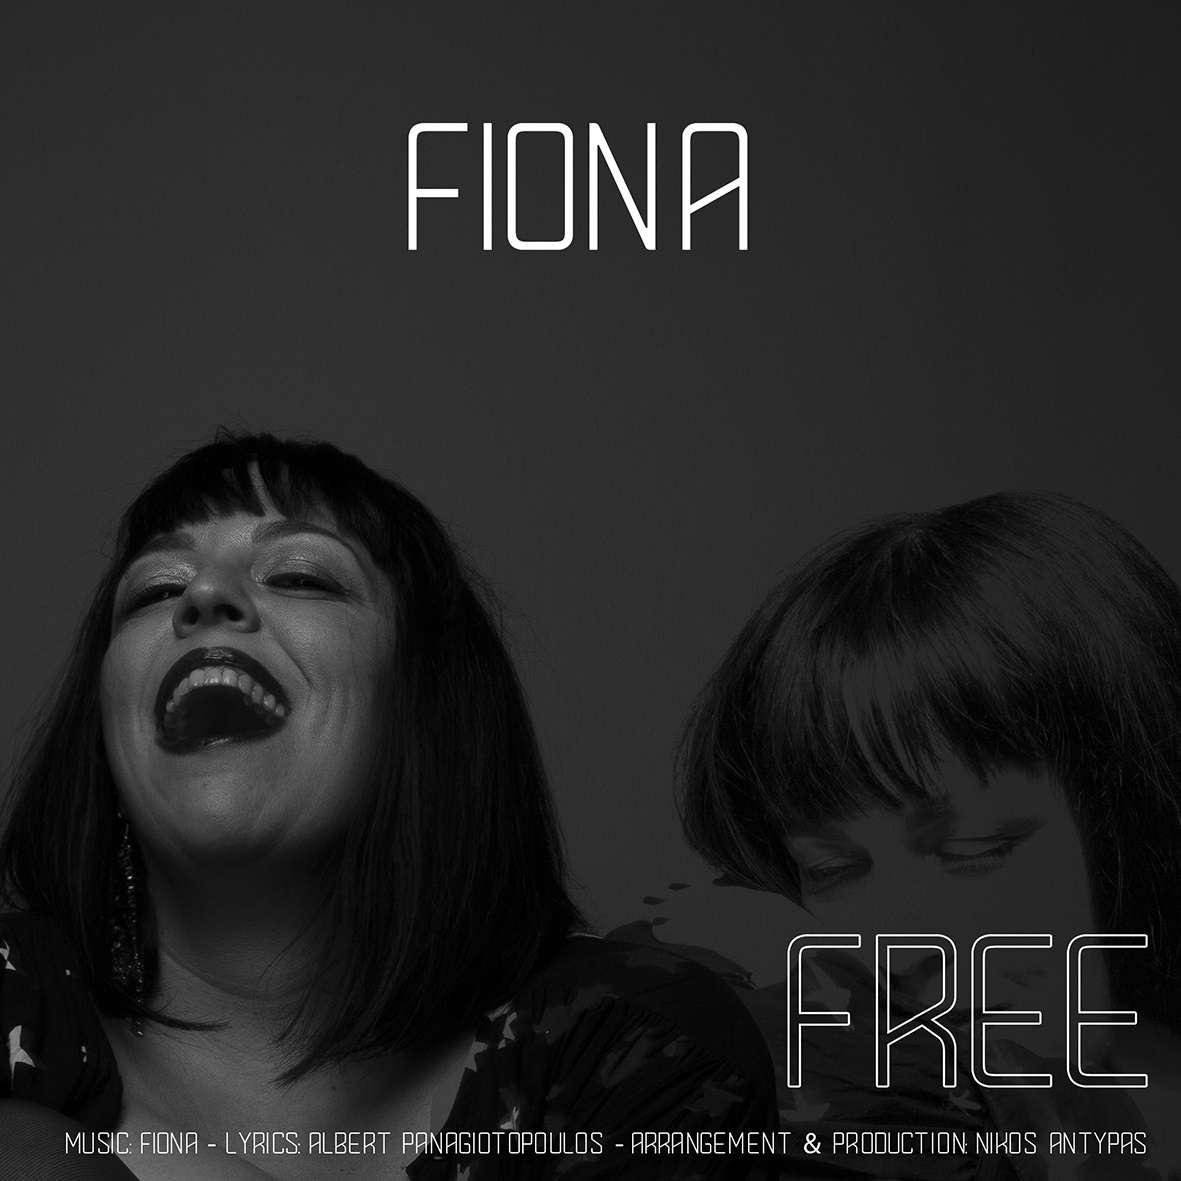 «FREE». Ένας ύμνος στην προσωπική ελευθερία και έκφραση από την Ελληνο-γερμανίδα FIONA